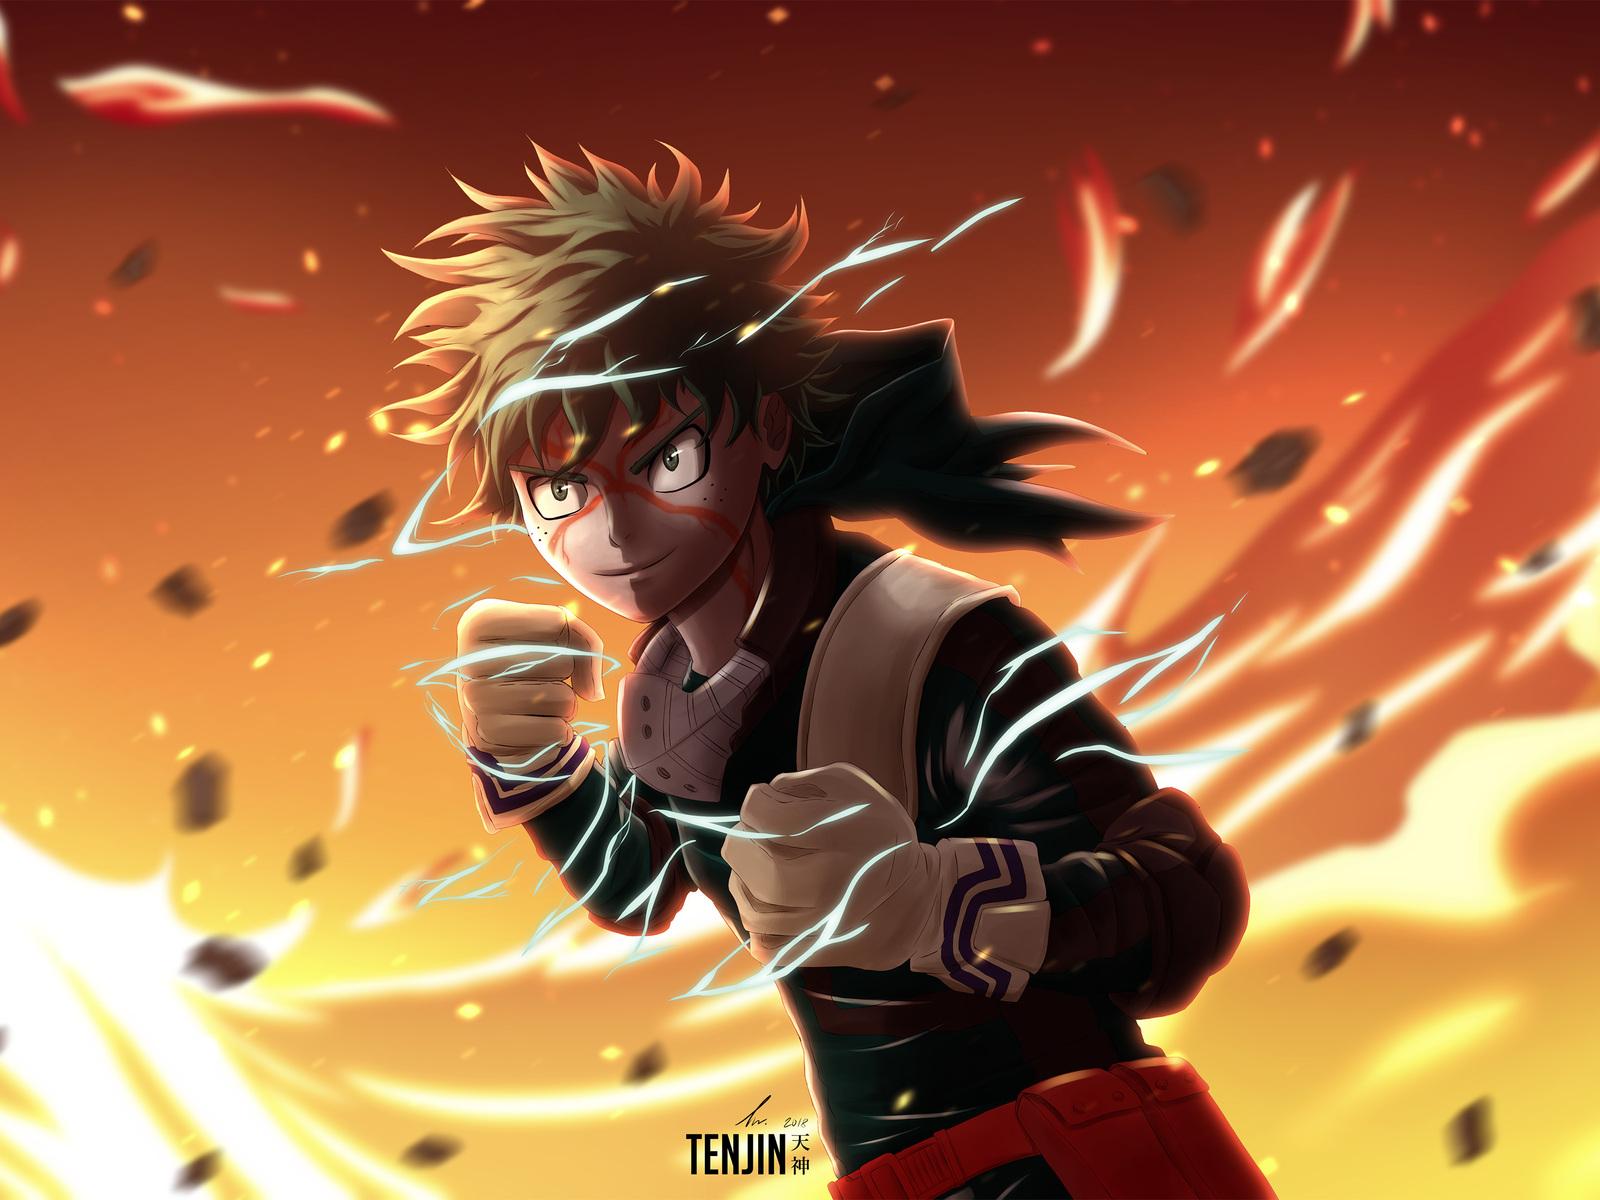 1600x1200 My Hero Academia Izuku Midoriya 4k 1600x1200 Resolution